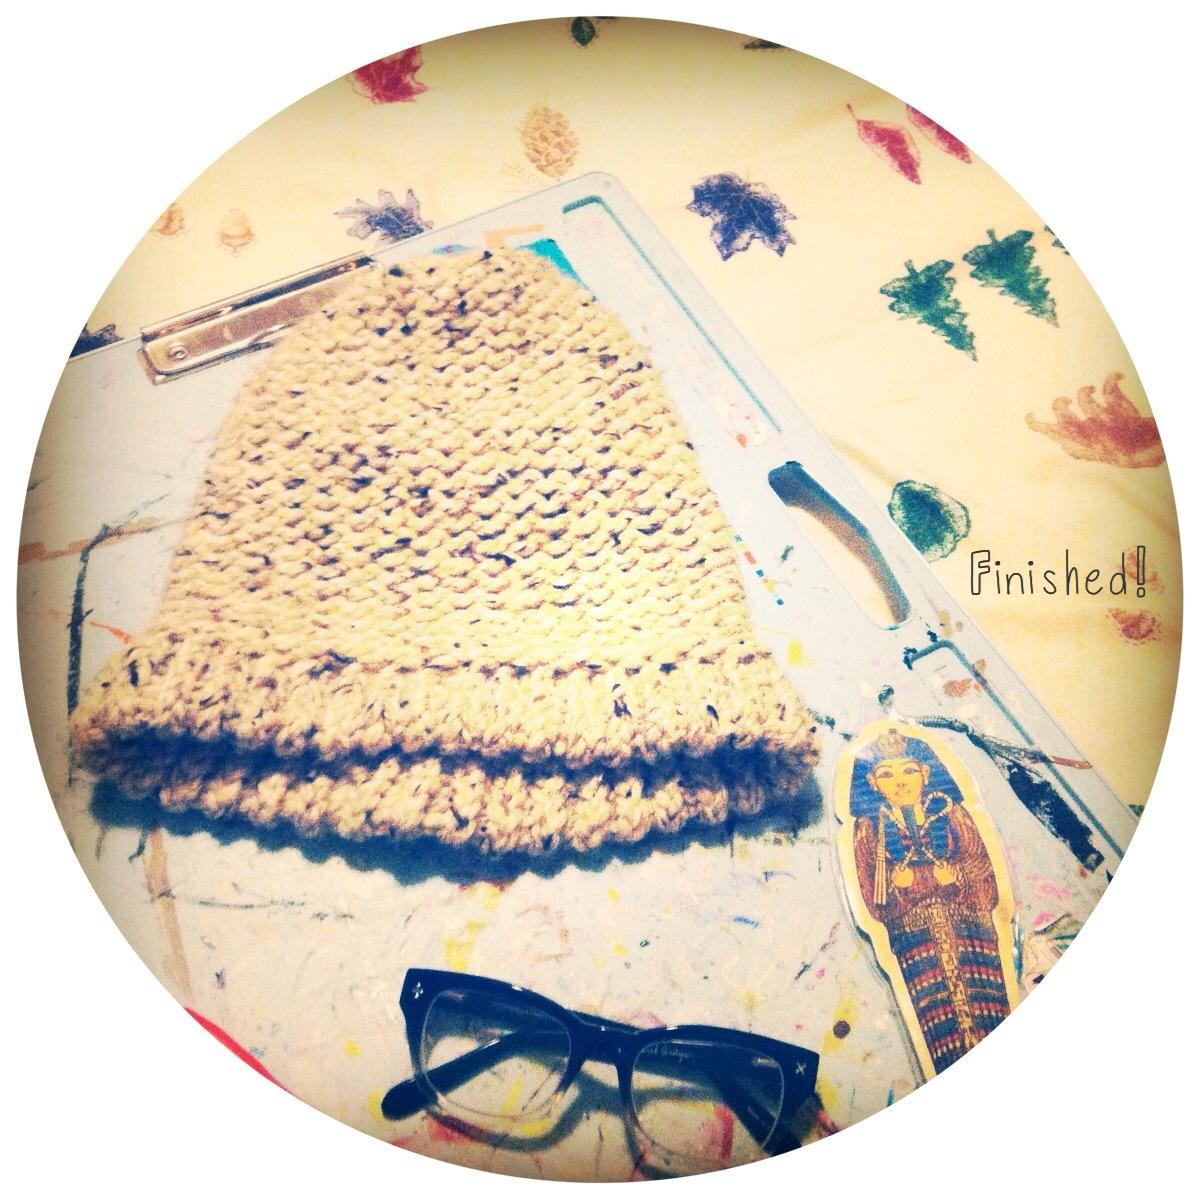 DIY_ROUND_LOOM_SLOUCH_HAT_BEANIE